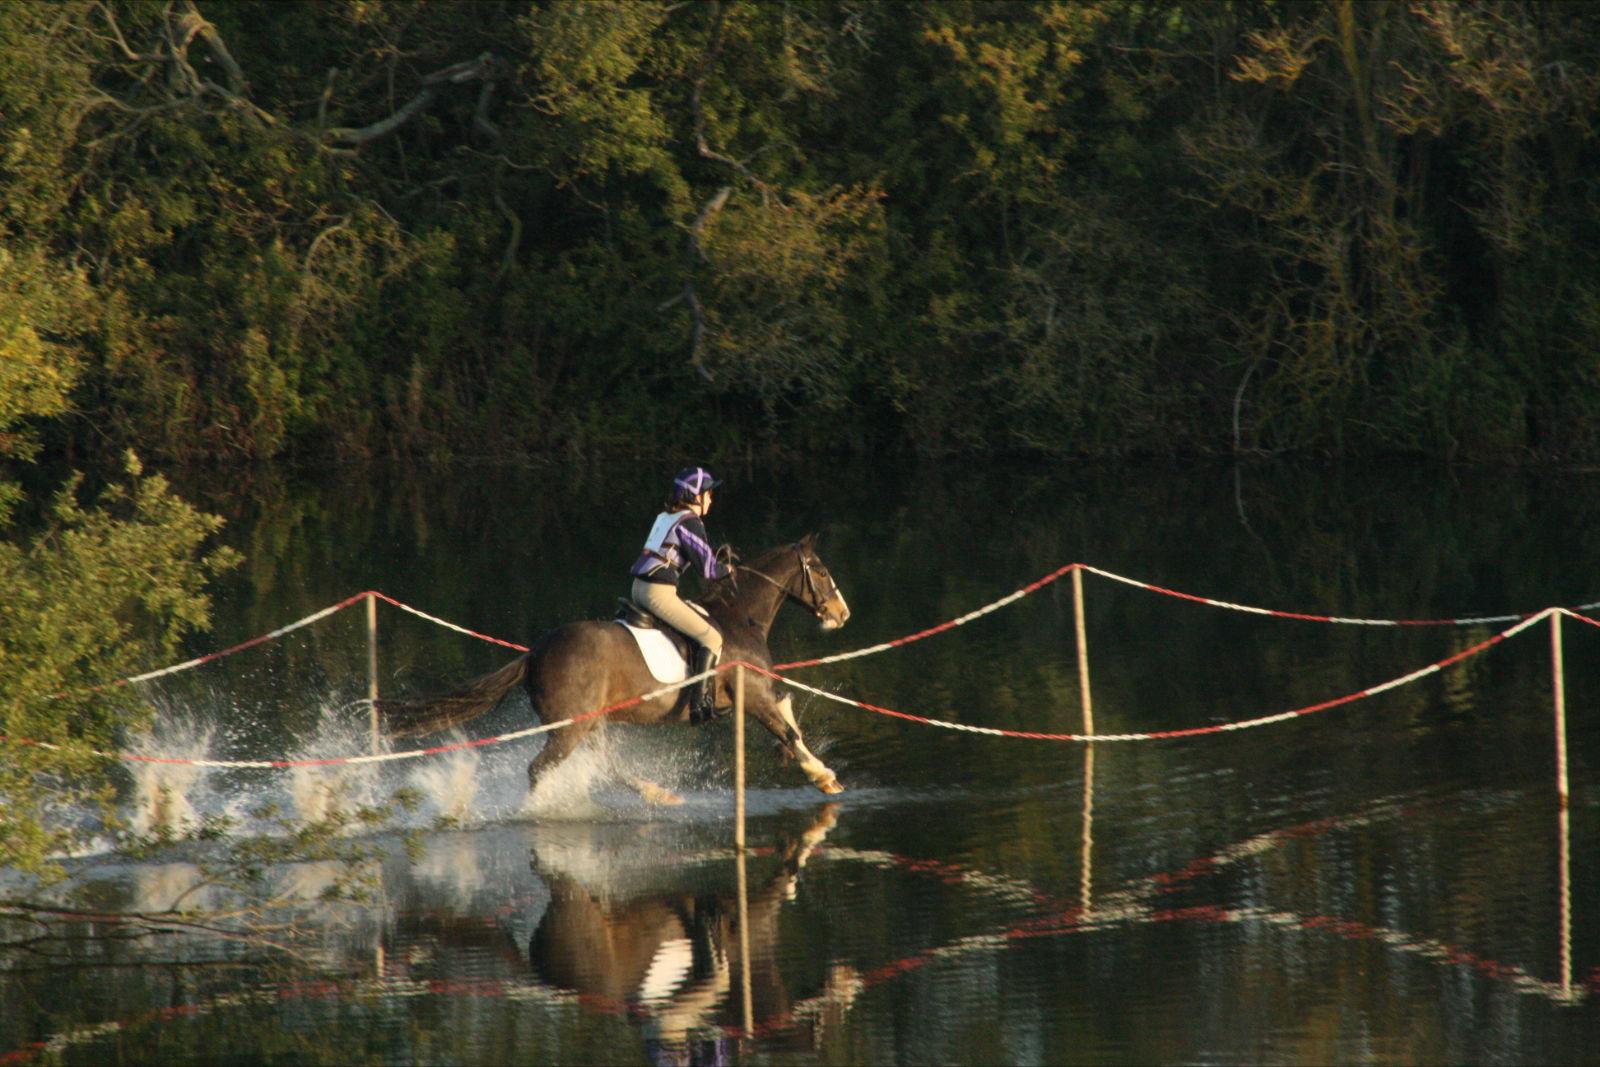 Jumpcross and Waterplay – Saturday 4 September 2021